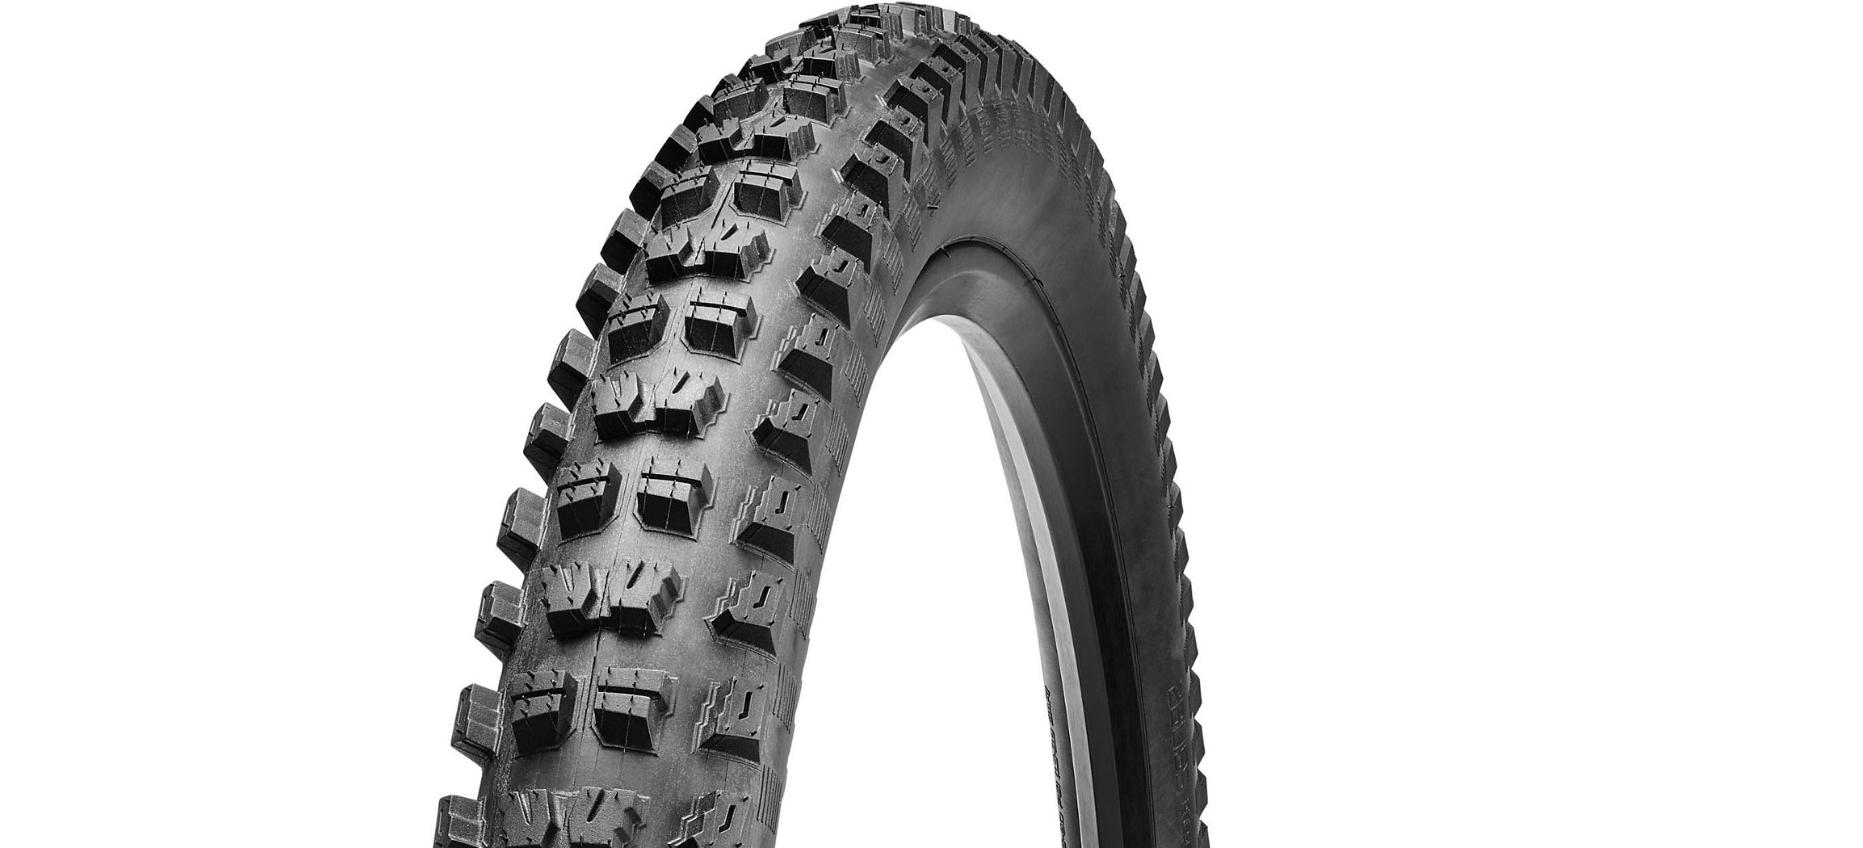 Specialized Specialized Butcher Control 2Bliss Ready Trail Folding Bead Tire, 29x2.3